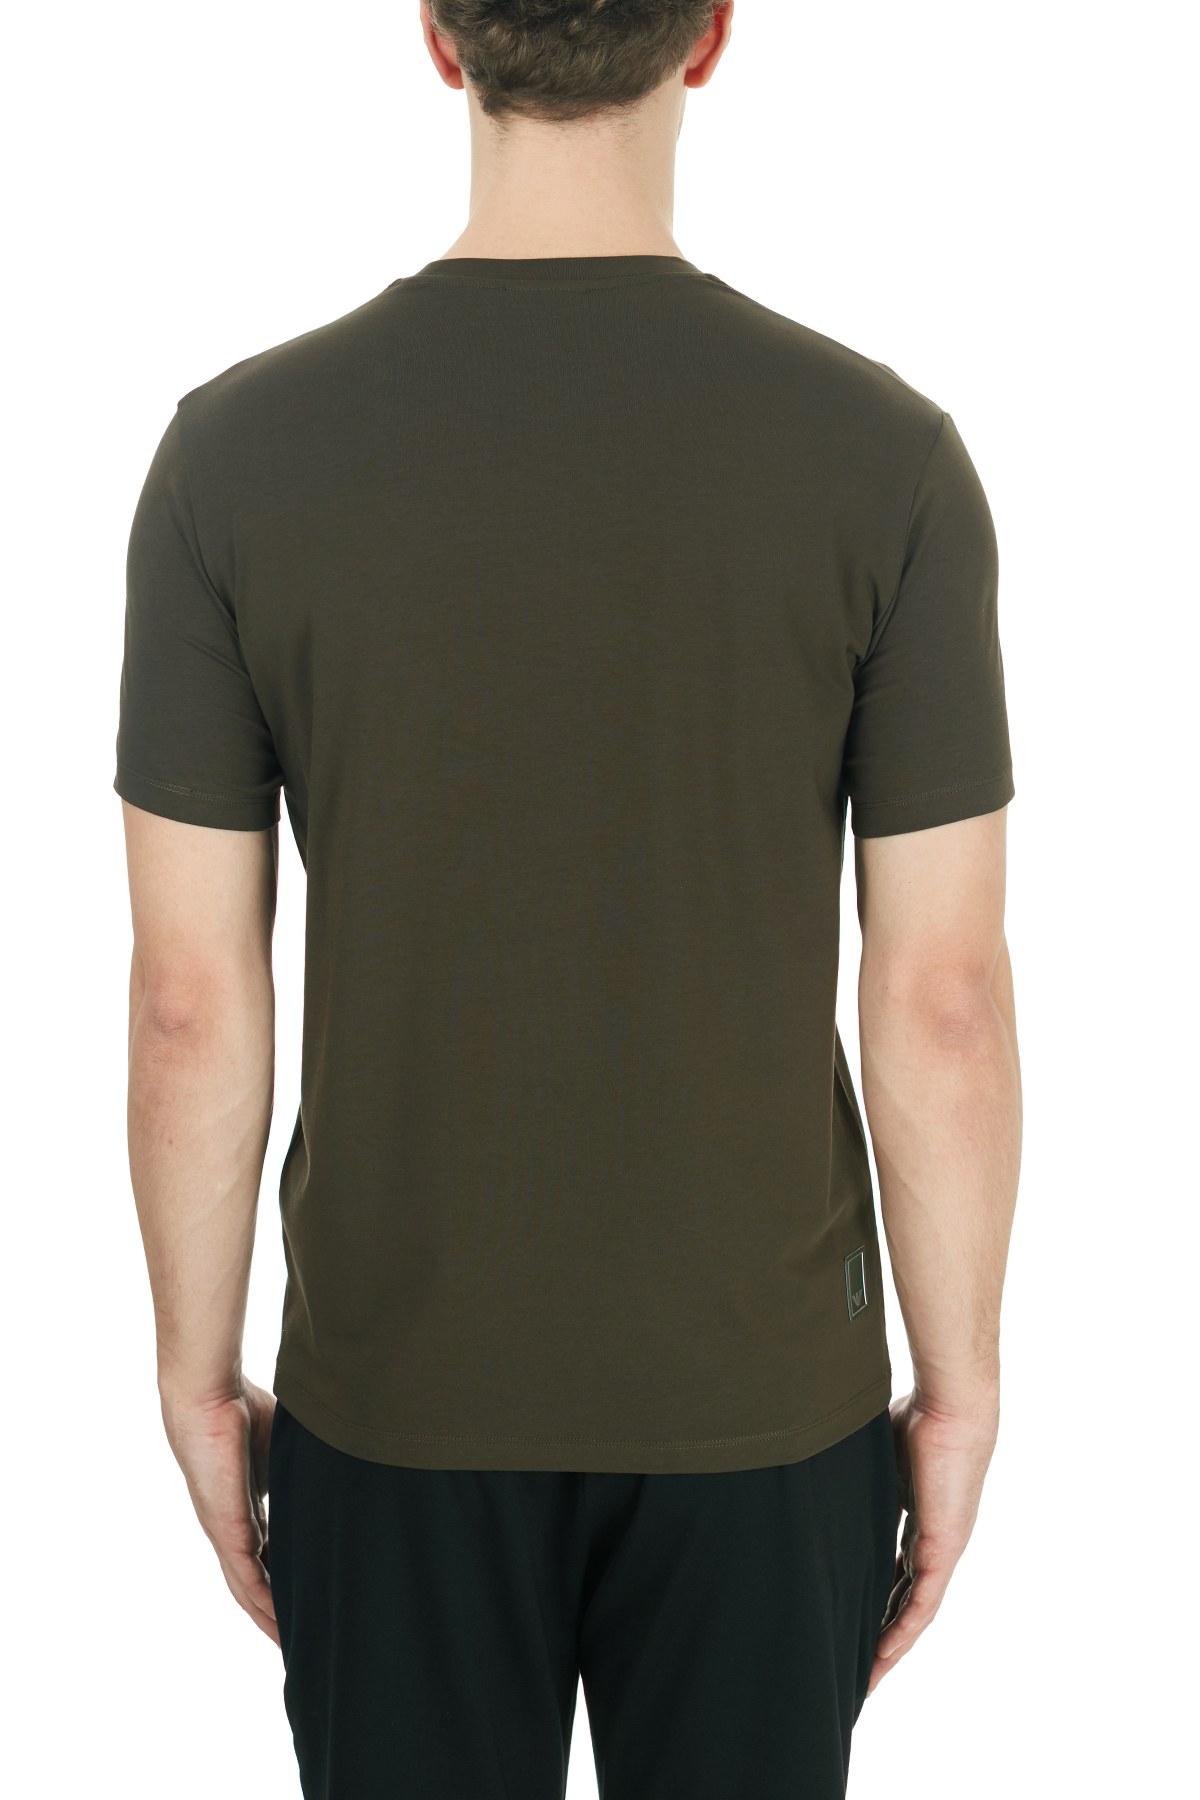 Emporio Armani Pamuklu Bisiklet Yaka Erkek T Shirt 6H1TS2 1JJRZ 0564 HAKİ